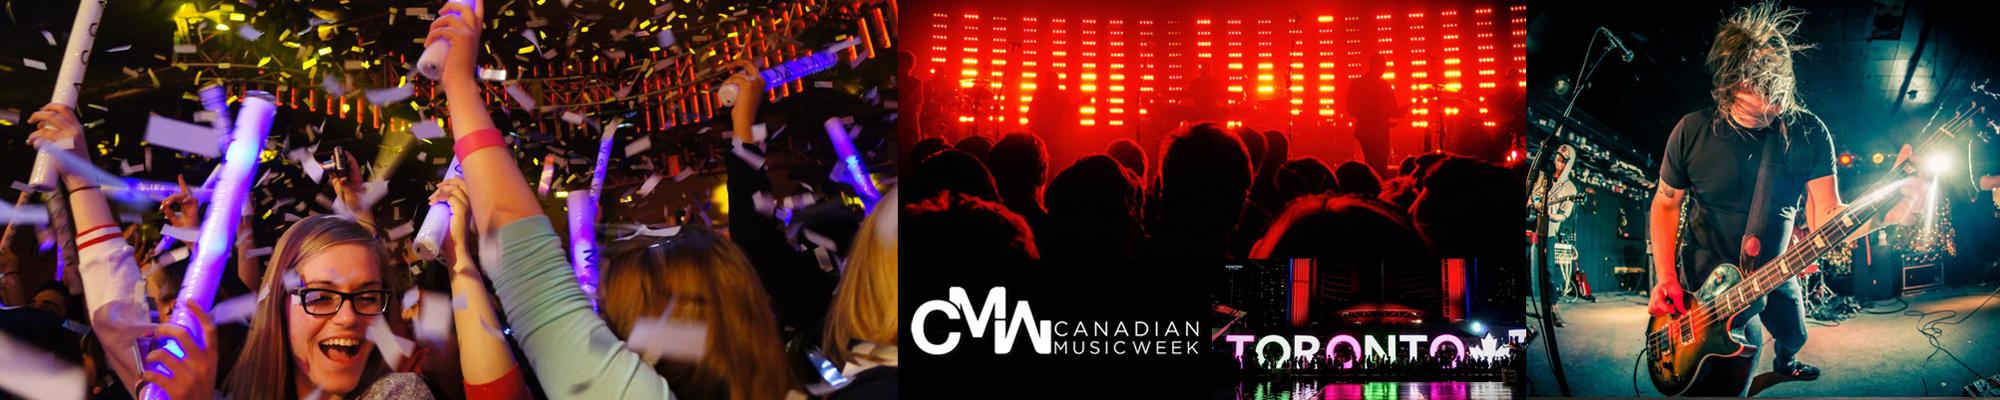 Festival musicali Canada: CANADIAN MUSIC WEEK